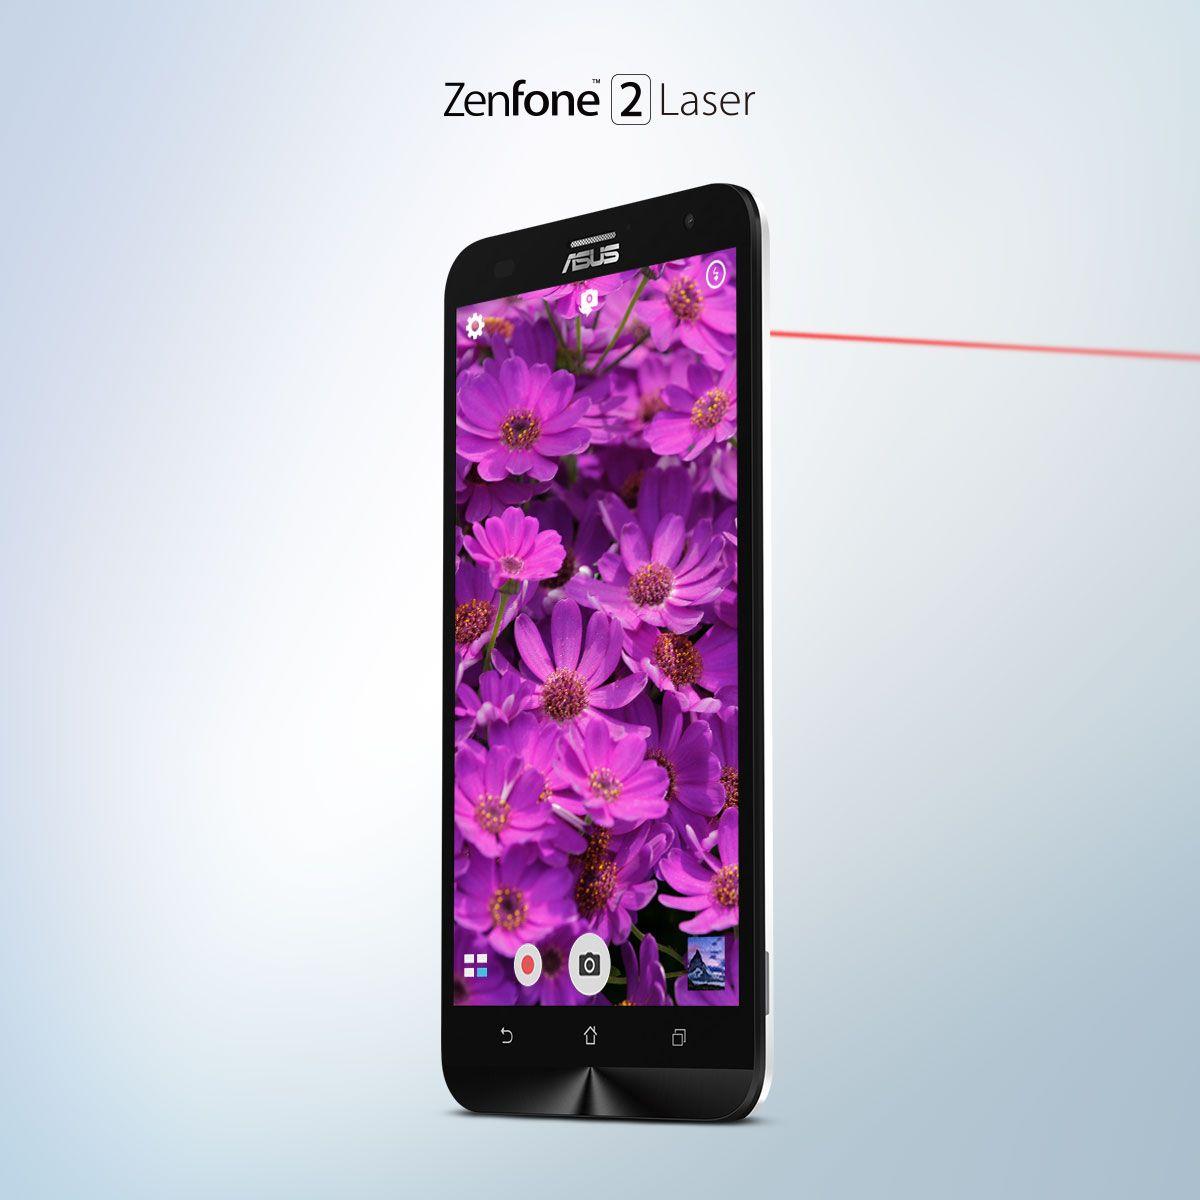 Asus Zenfone 2 Laser Pinterest Ze551ml Ram 4gb Rom 32gb